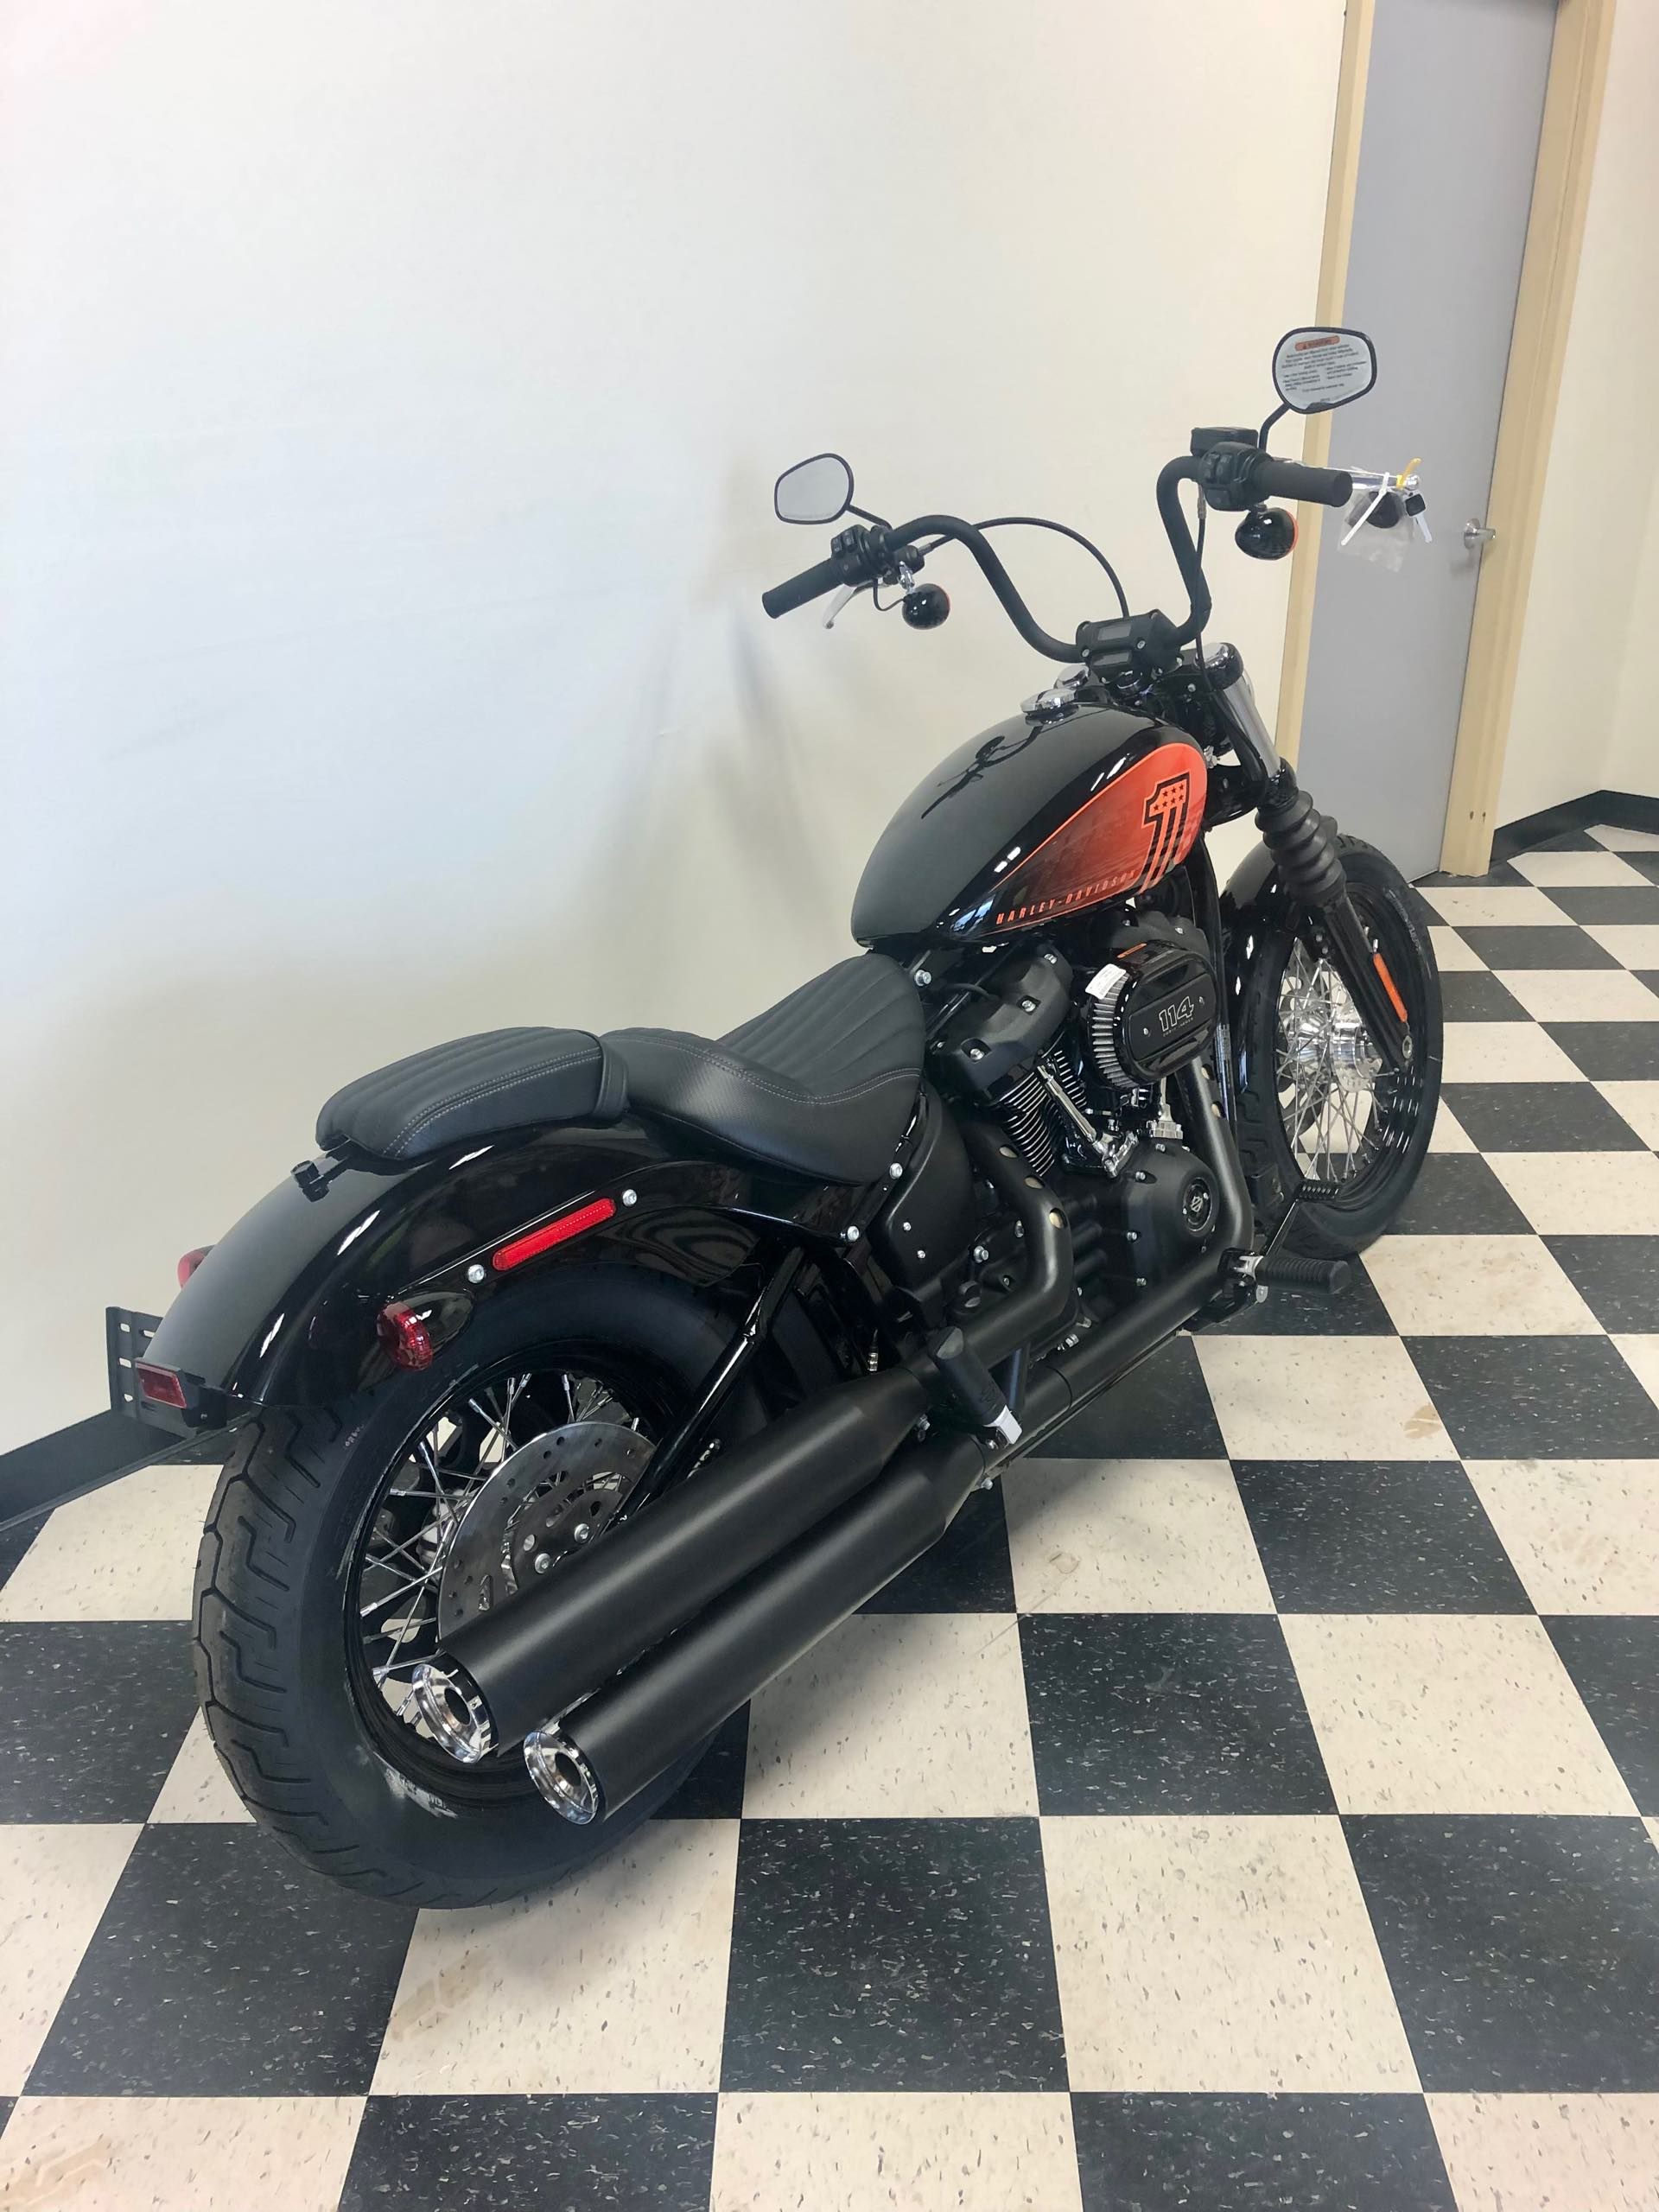 2021 Harley-Davidson Cruiser Street Bob 114 at Deluxe Harley Davidson